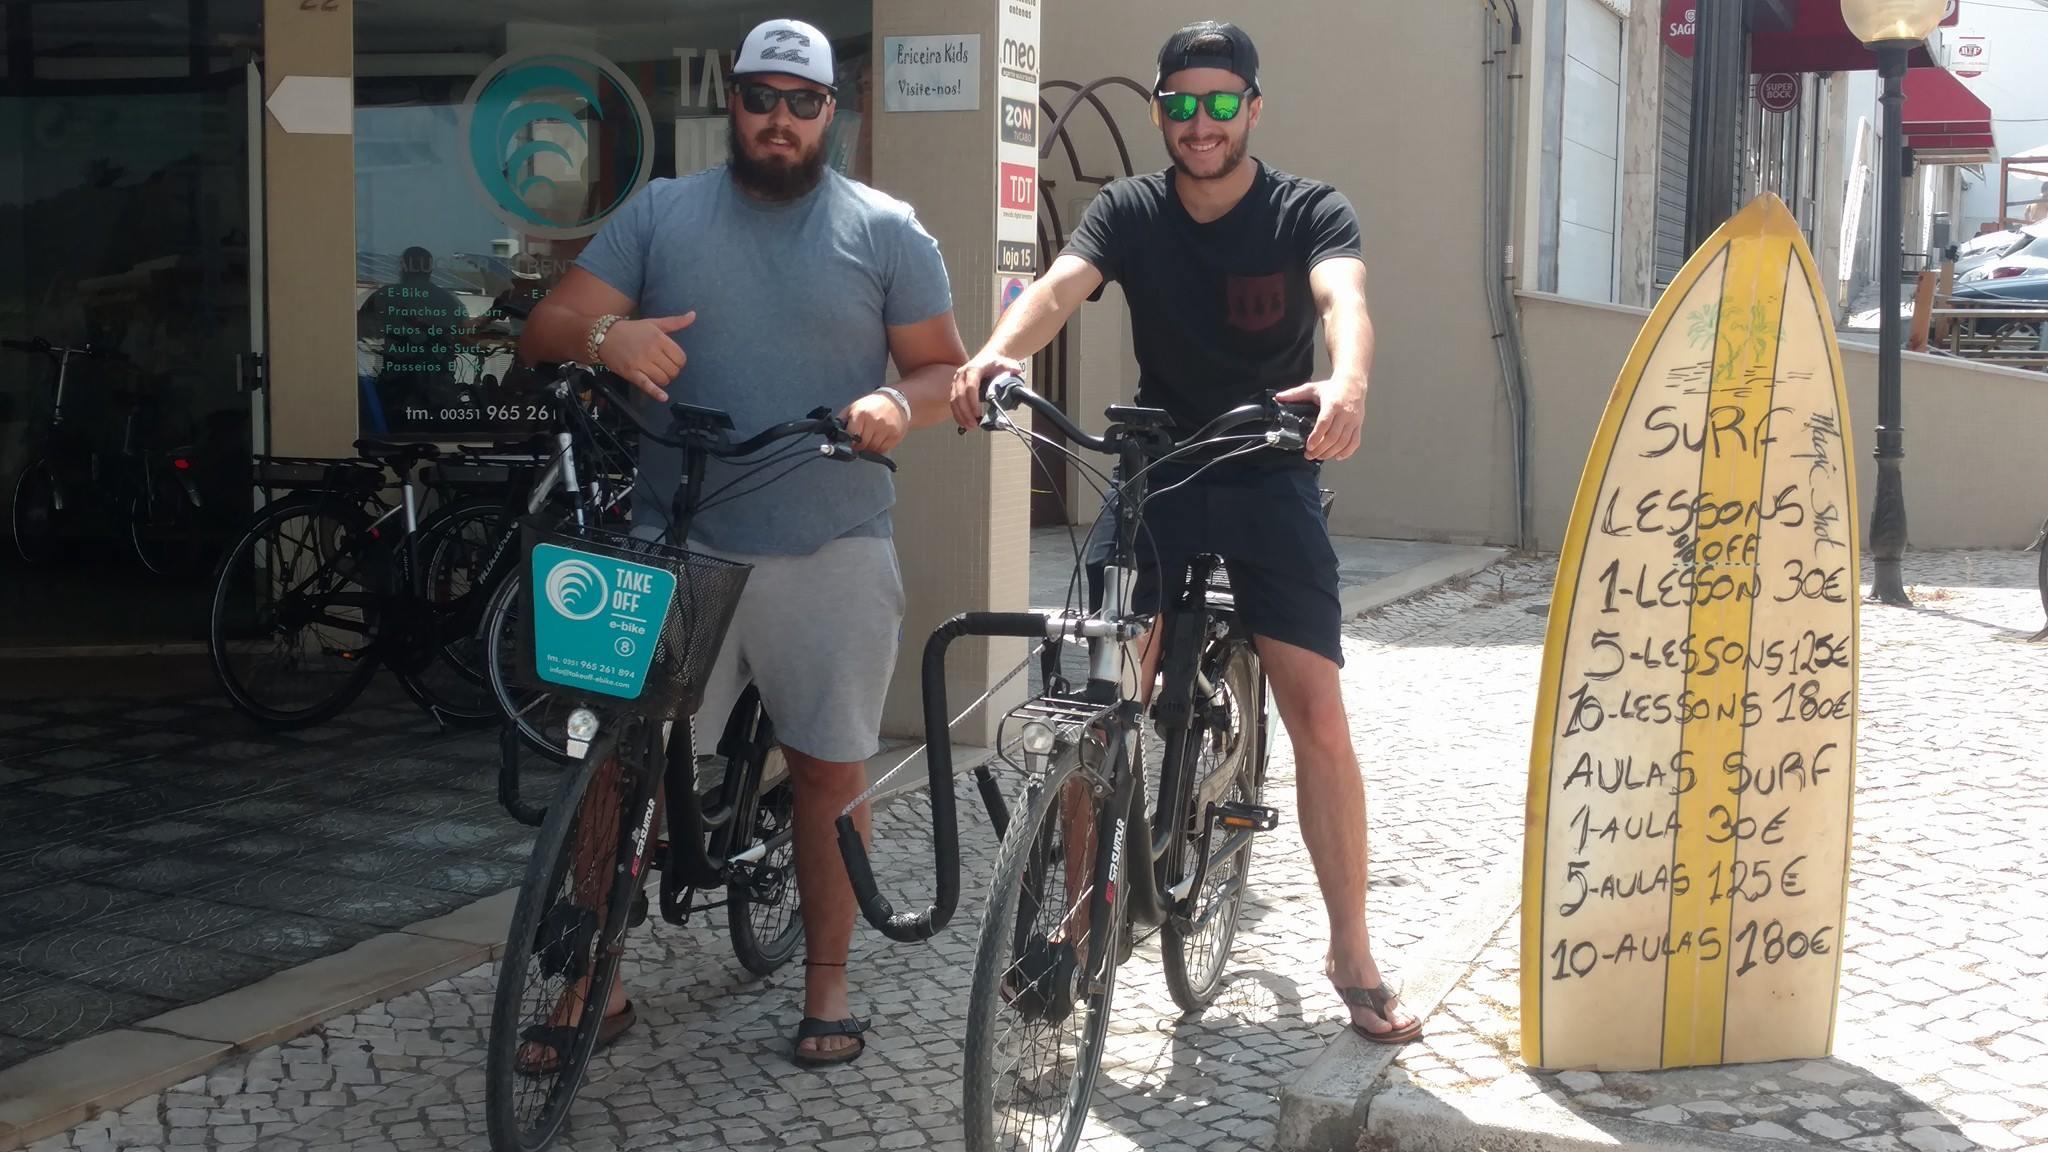 MOMENTOS TAKE OFF e-bike